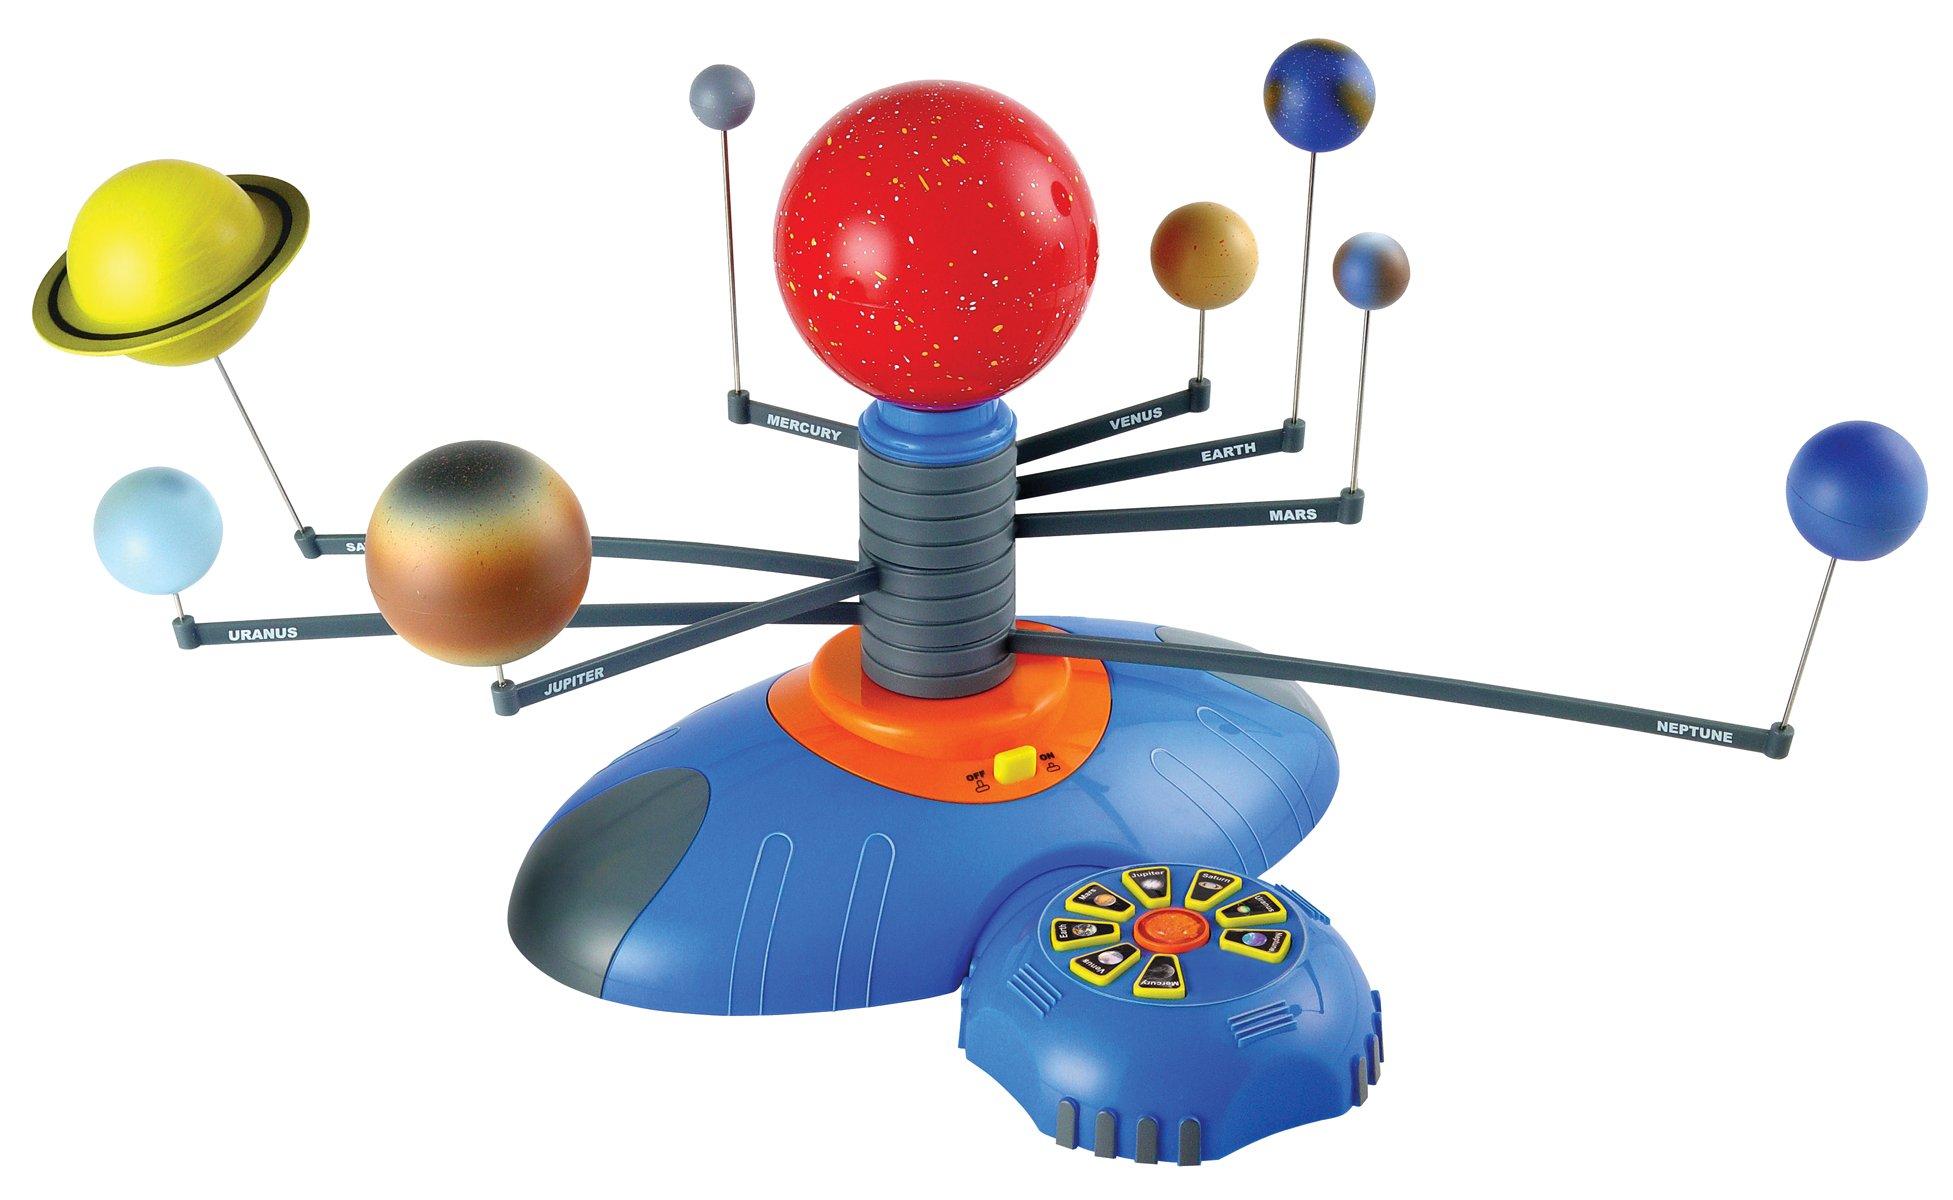 Vinco Eduscience Solar System Toy